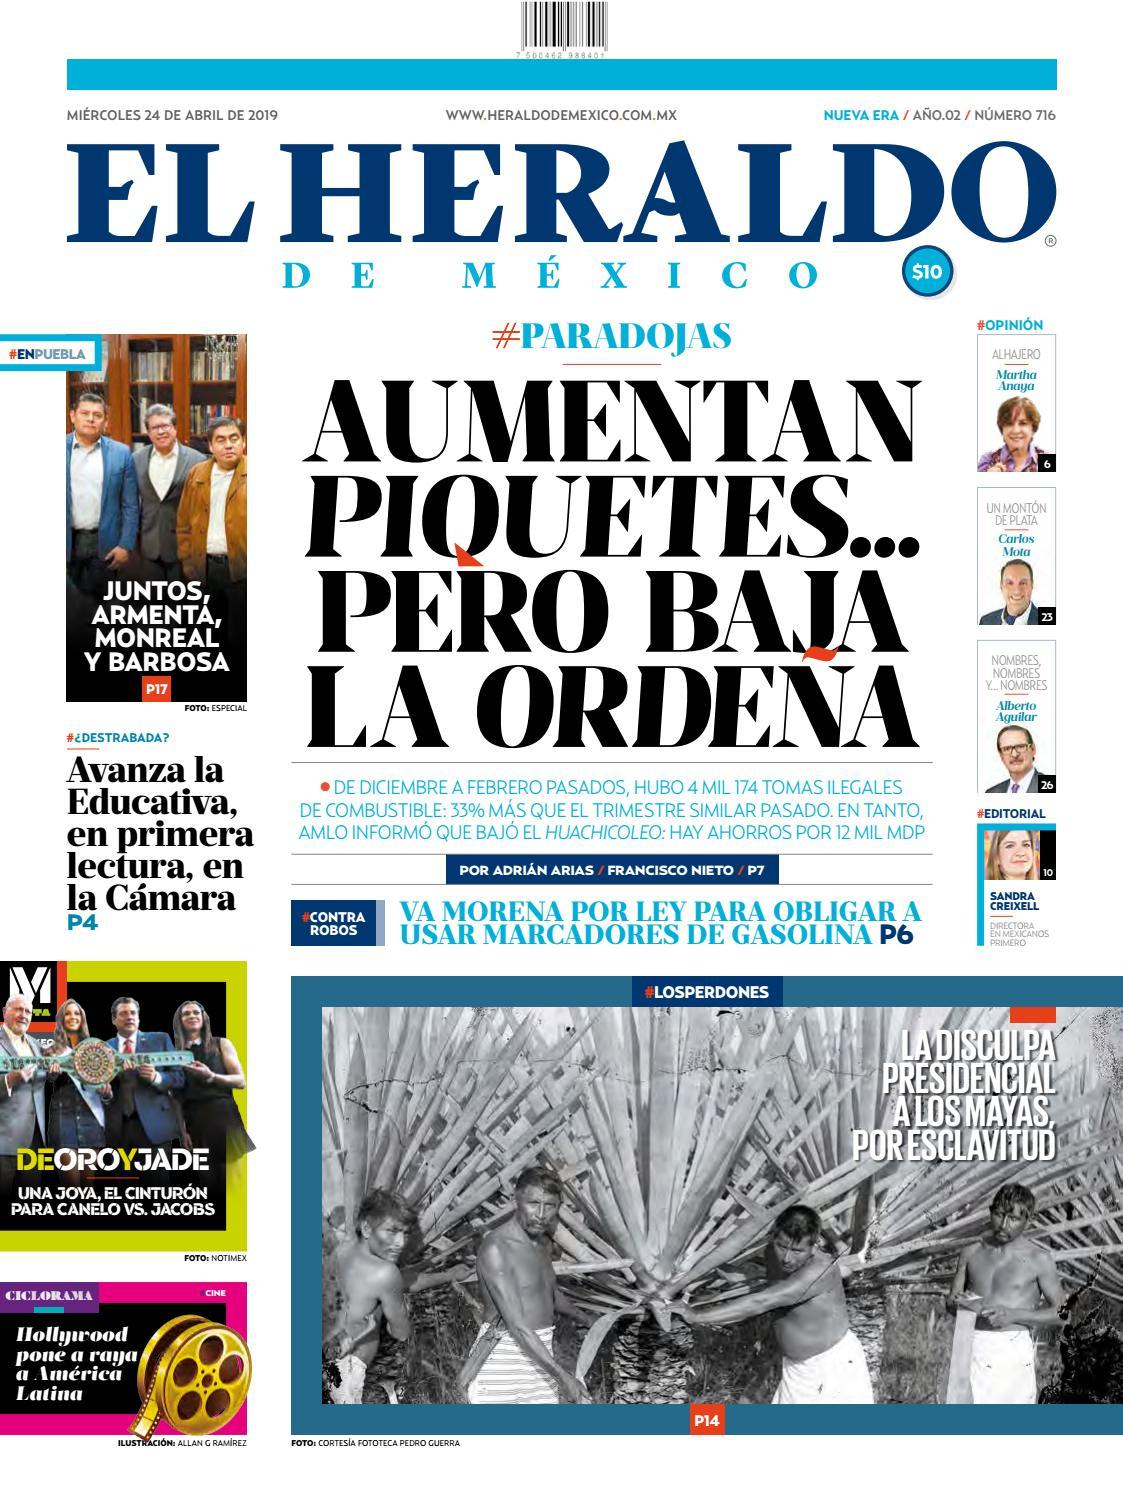 0b5aec191 Miércoles 24 de abril del 2019 by El Heraldo de México - issuu